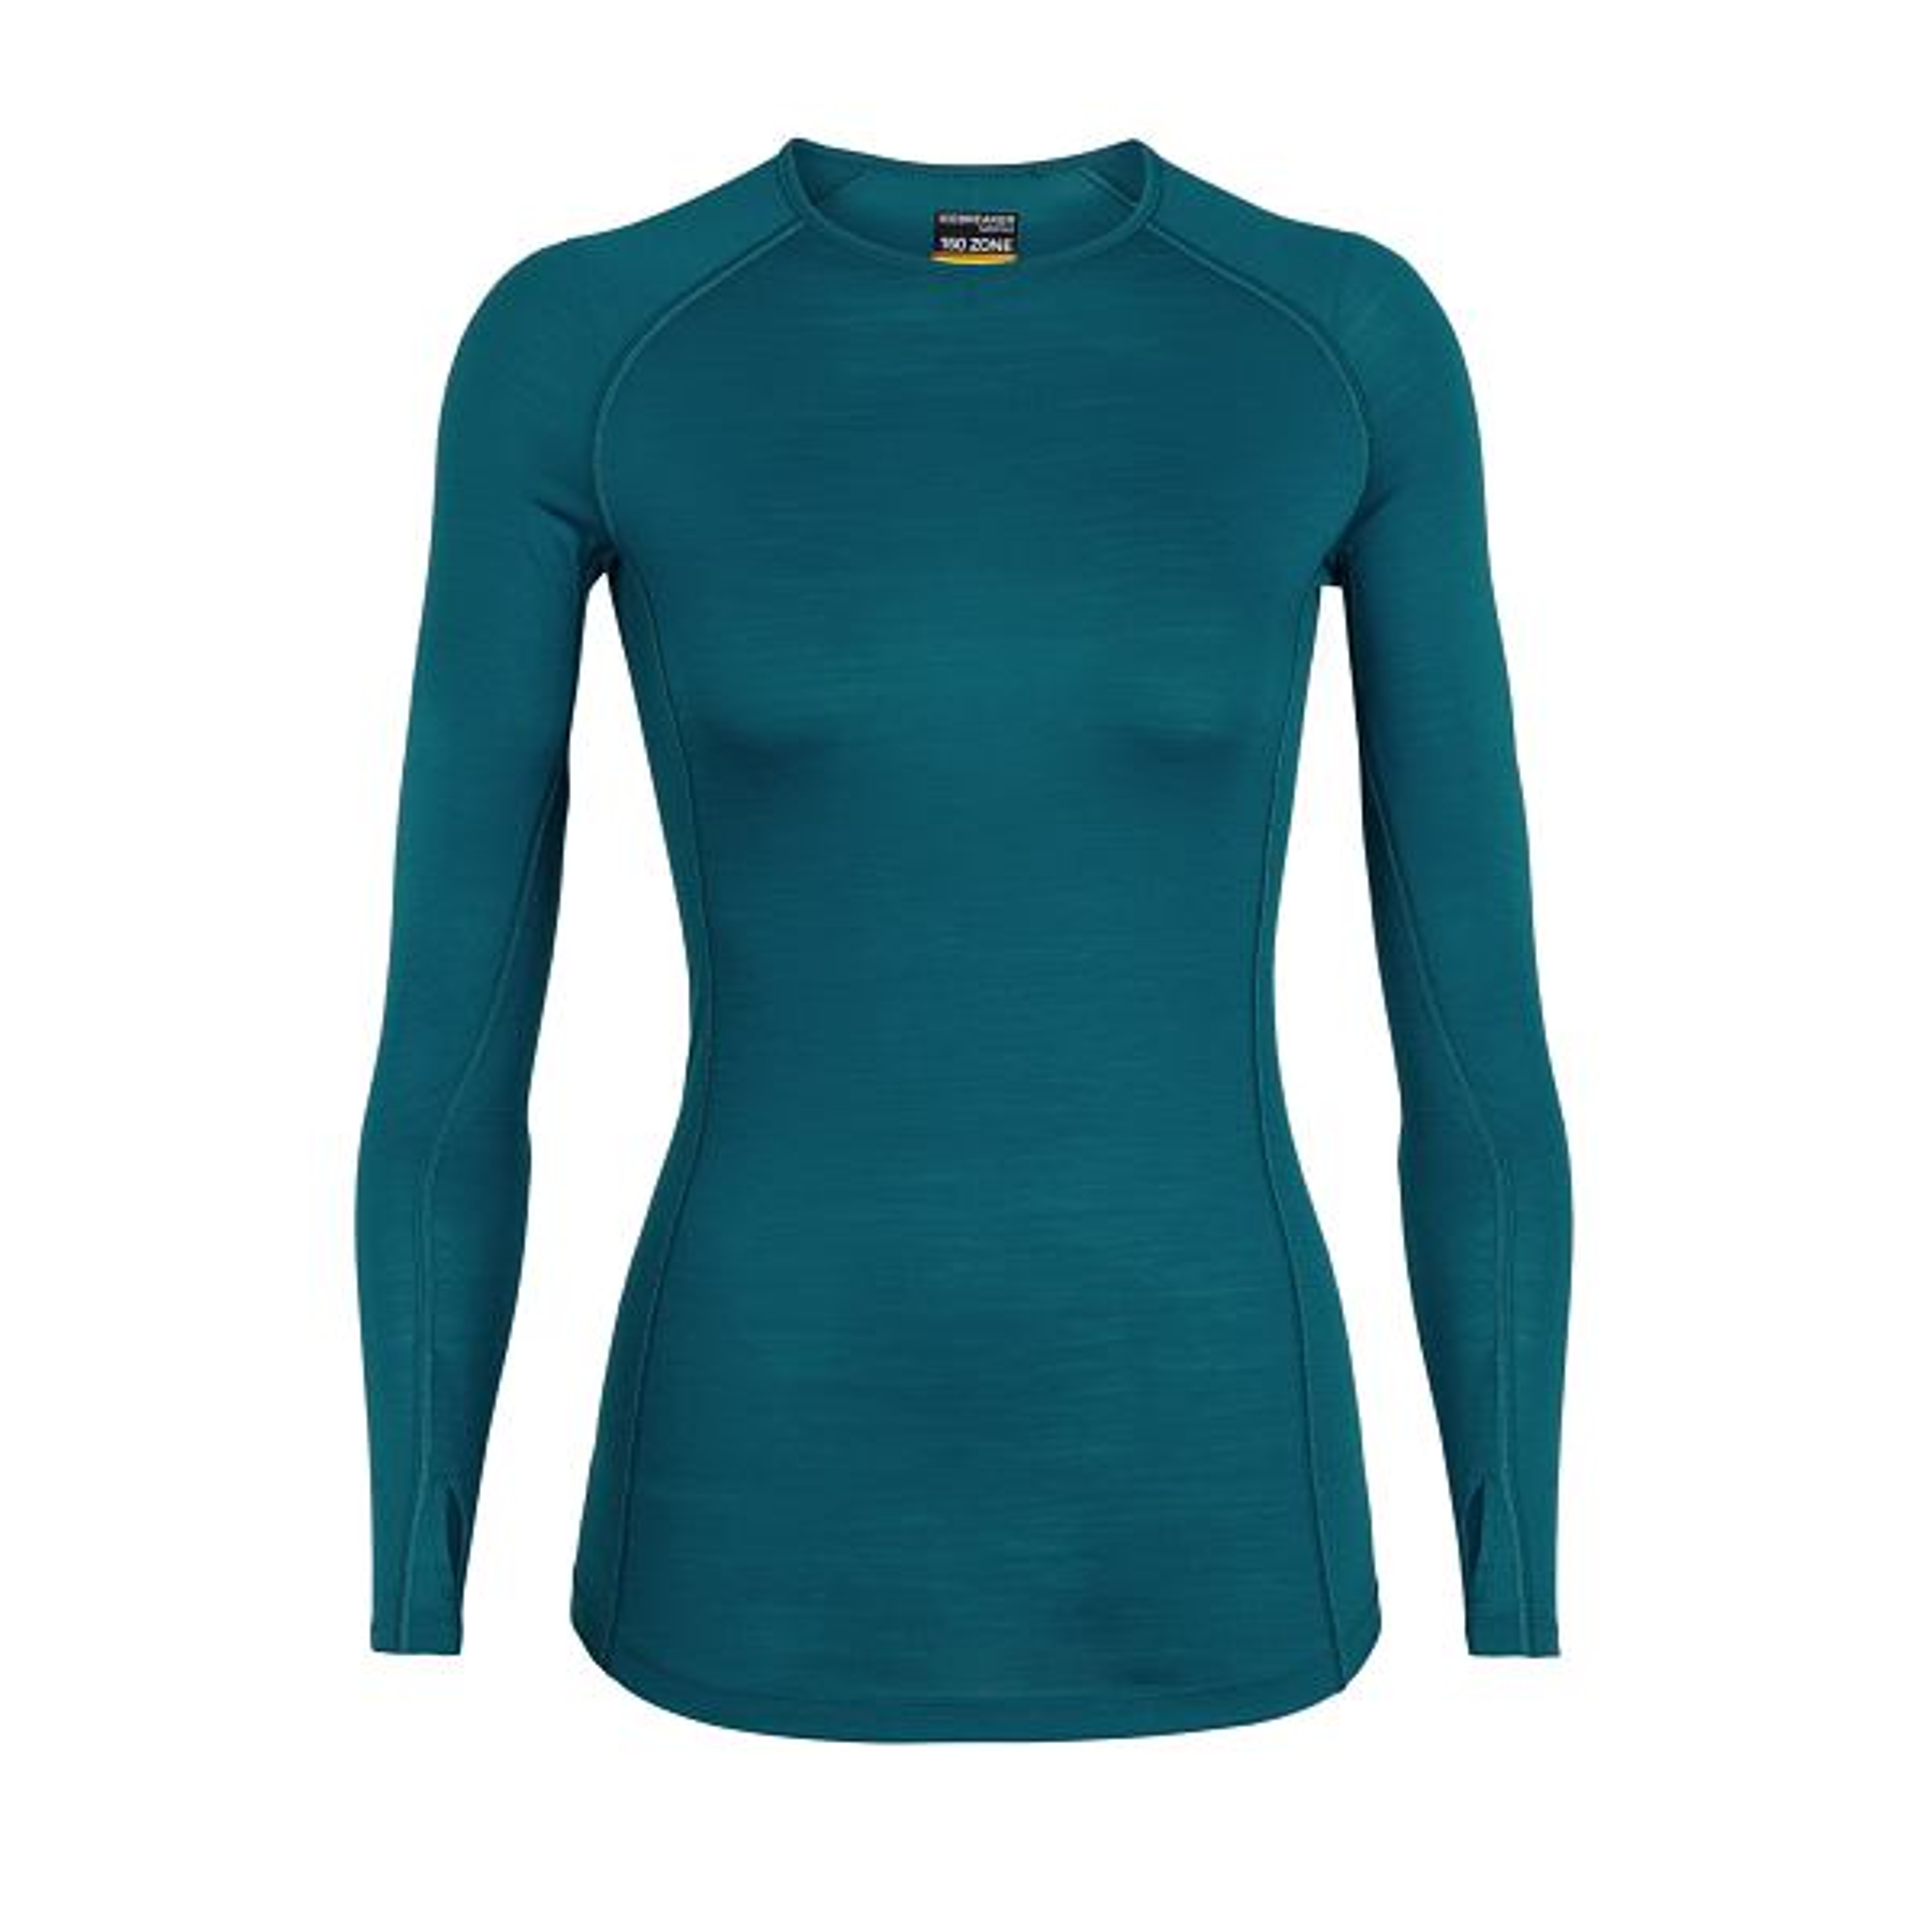 150 Zone Crewe Long Sleeve - Women's